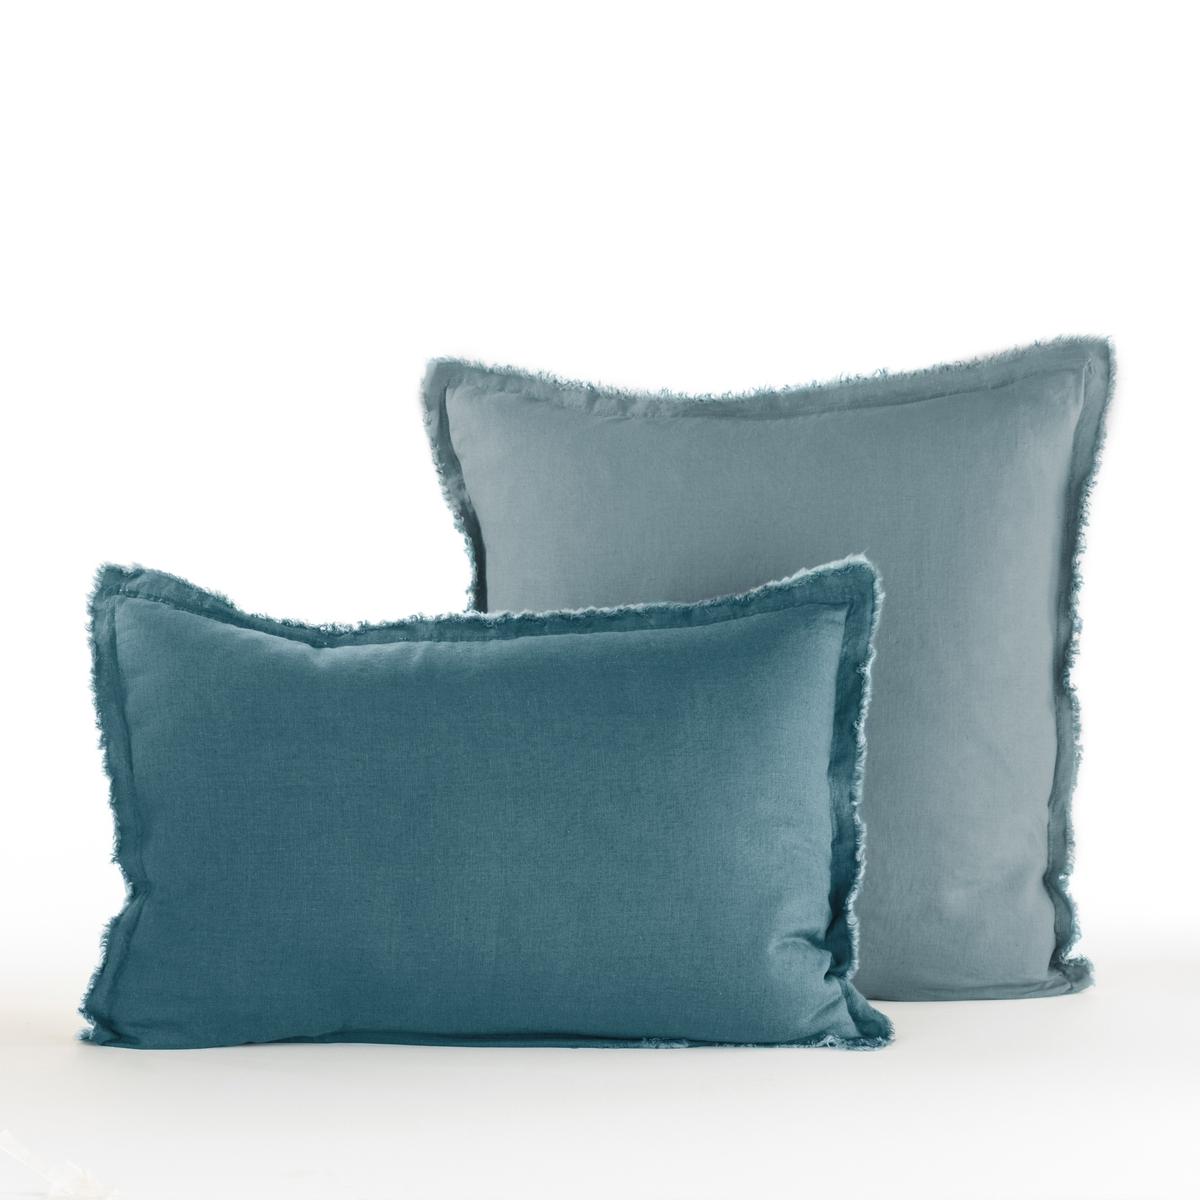 Наволочка PurangiМатериал :- 100% лен.Отделка :   - Бахрома- Форма мешка.Уход :   Машинная стирка при 60 °С. Размеры :50 x 70 см : прямоугольная наволочка - 65 x 65 см : квадратная наволочка<br><br>Цвет: зеленый кедровый,светло-синий,серый